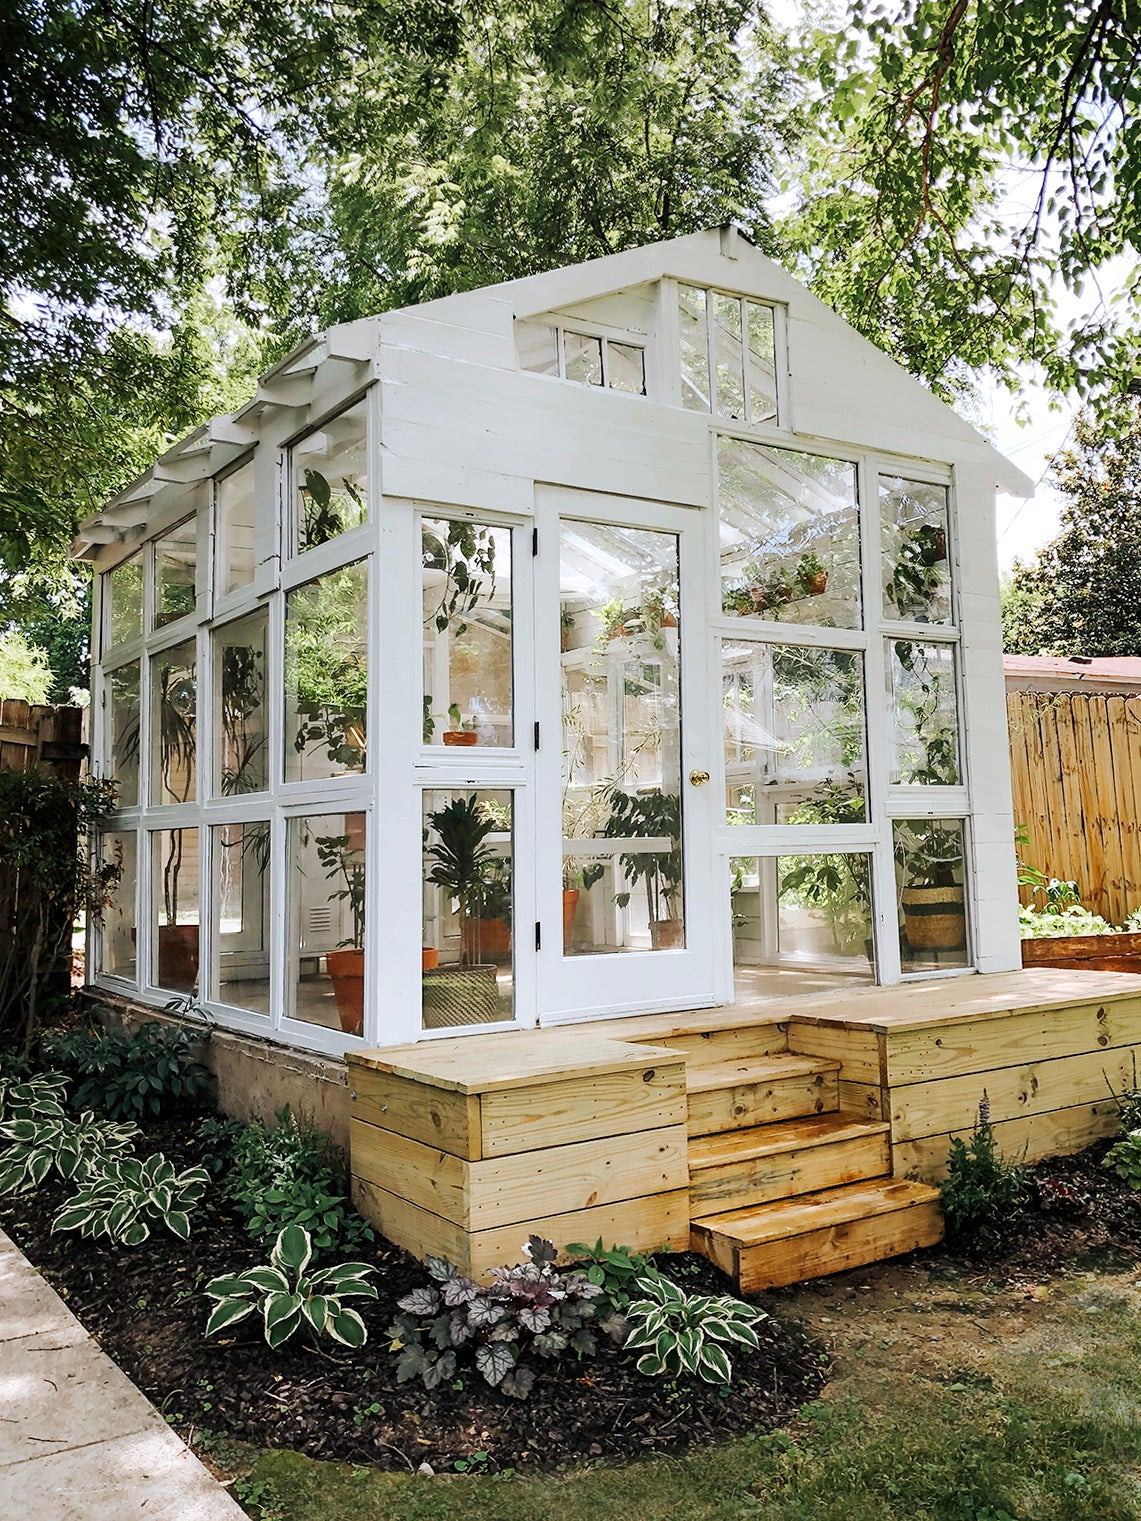 00-FEATURE-greenhouse-DIY-domino